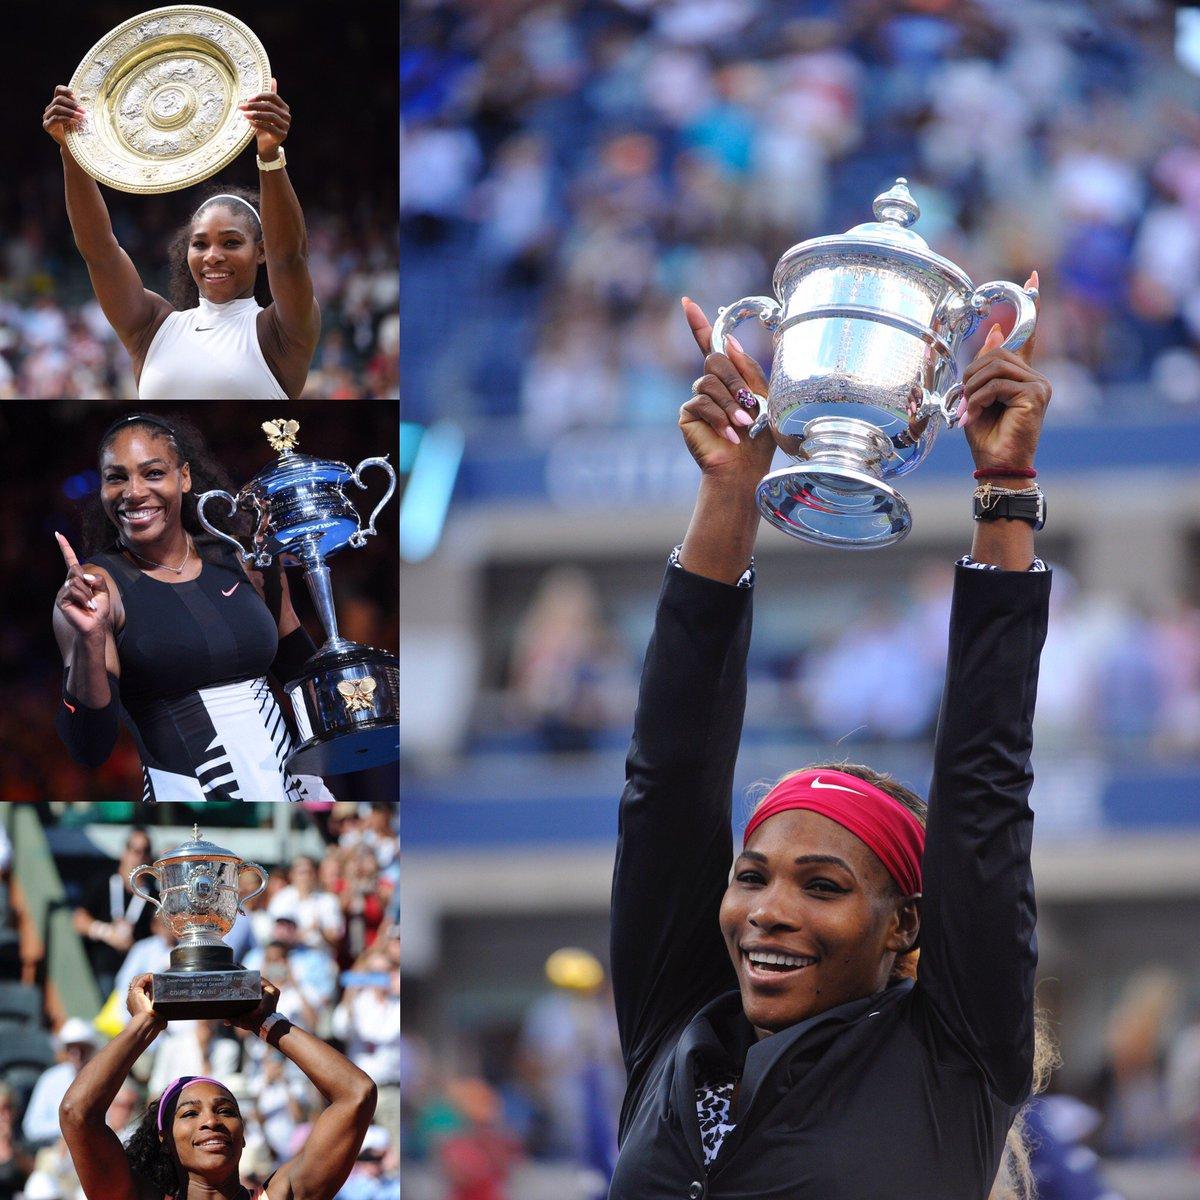 7 x Australian Open 🏆 3 x French Open 🏆 7 x Wimbledon 🏆 6 x US Open 🏆...